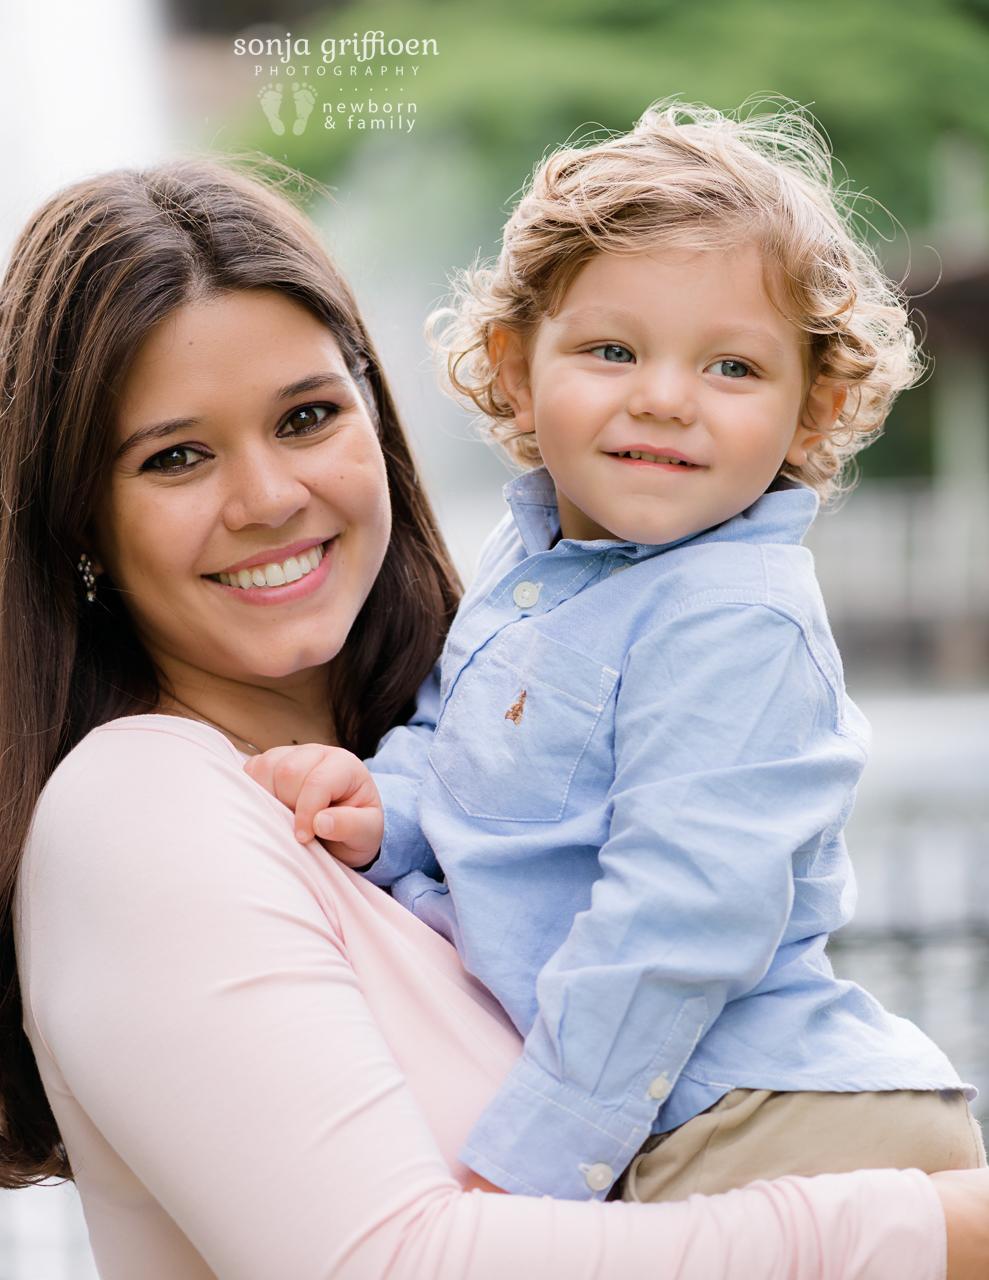 Maria-Maternity-Brisbane-Newborn-Photographer-Sonja-Griffioen-25.jpg